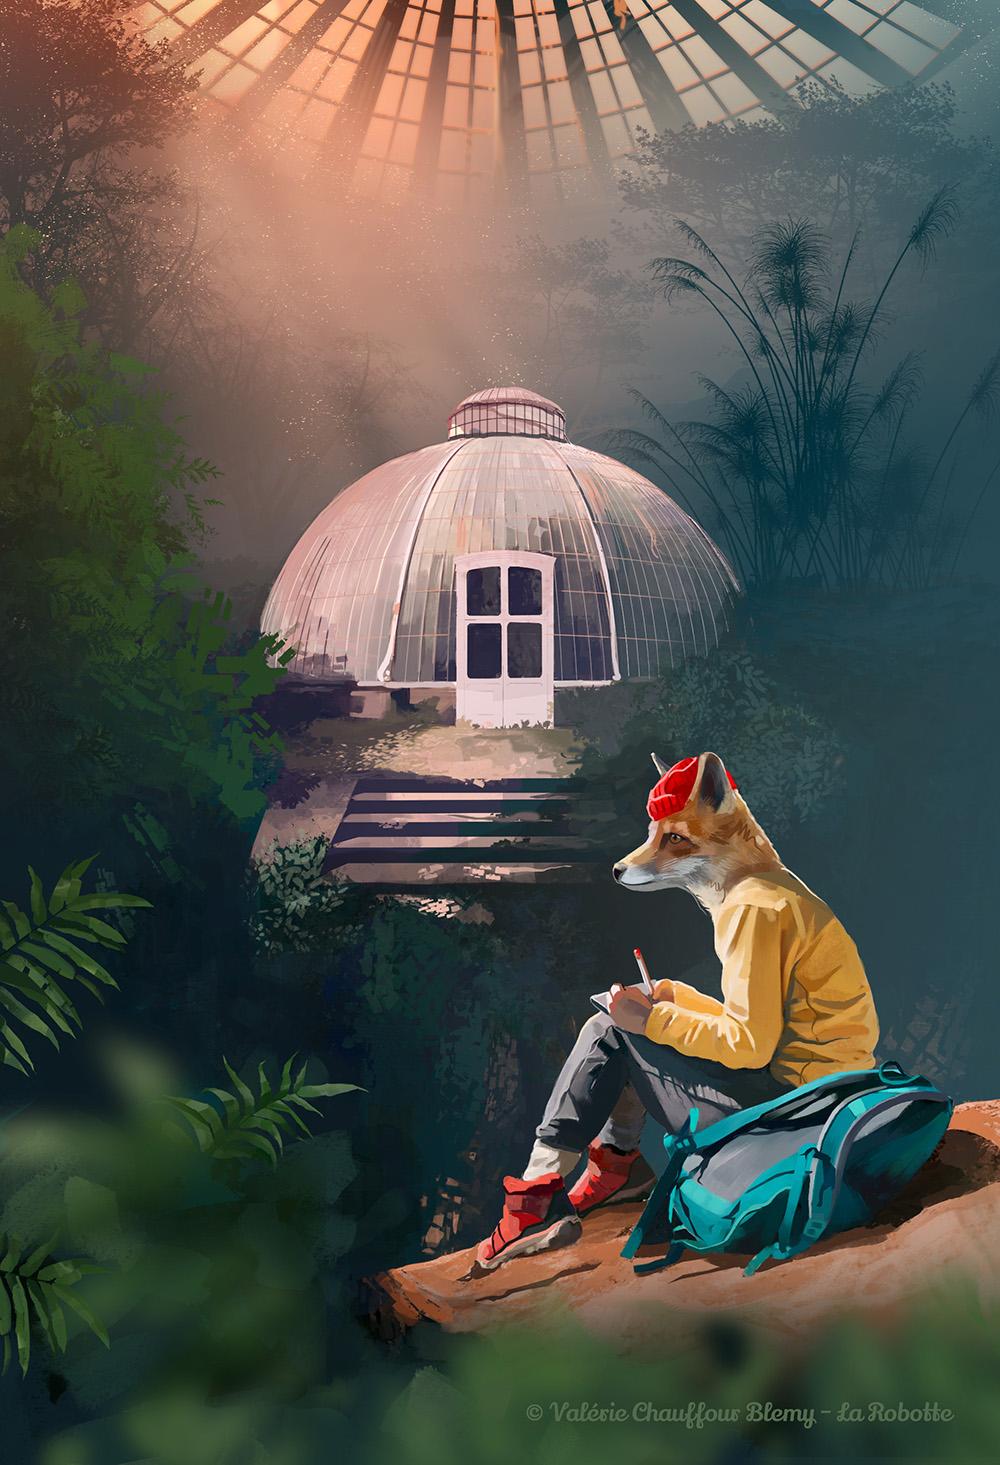 Journey - Concept art - Digital art - Valérie Chauffour Blemy @LaRobotte